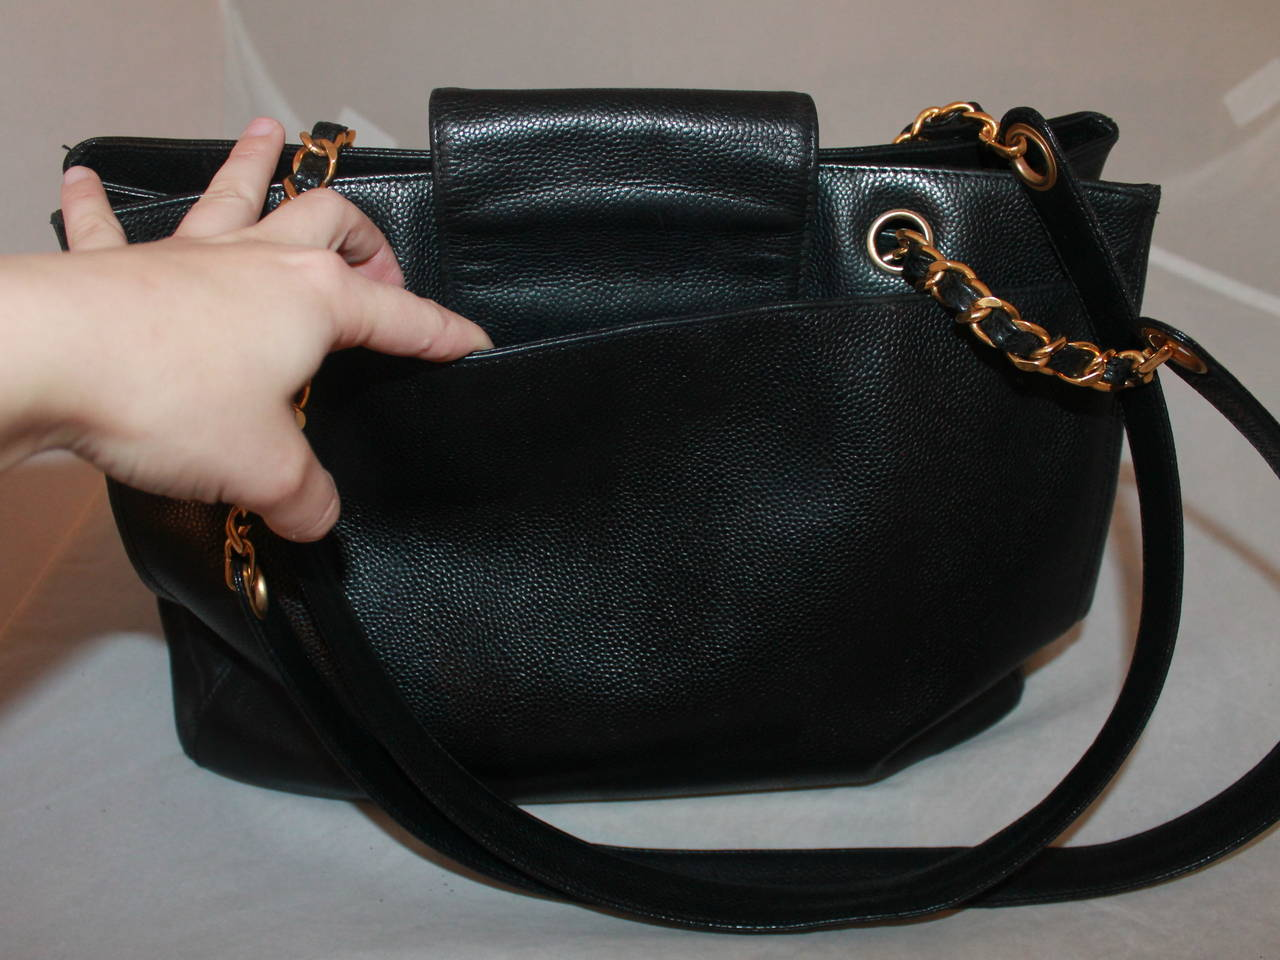 488fcc201e684f Chanel Vintage Black Caviar Tote Handbag GHW In Good Condition For Sale In  Palm Beach,